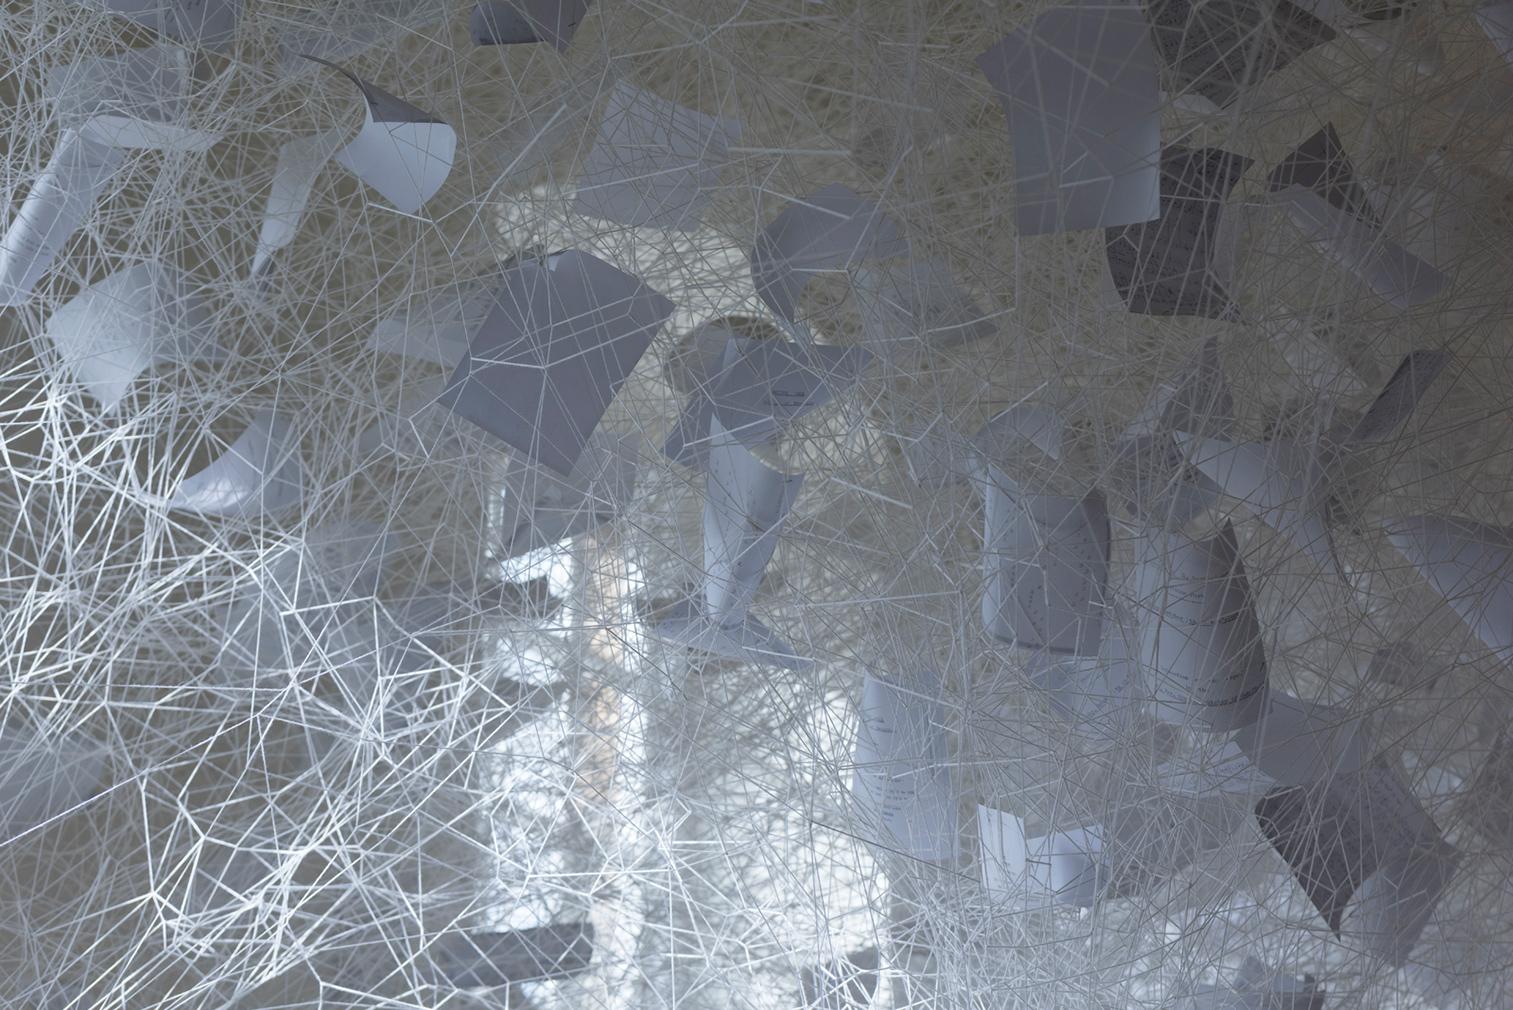 Chiharu Shiota, Beyond Time, 2018. White thread, metal piano, musical notes. (c) VG Bild- Kunst, Bonn, 2018 and the artist. Courtesy Yorkshire Sculpture Park. Photography: Jonty Wilde